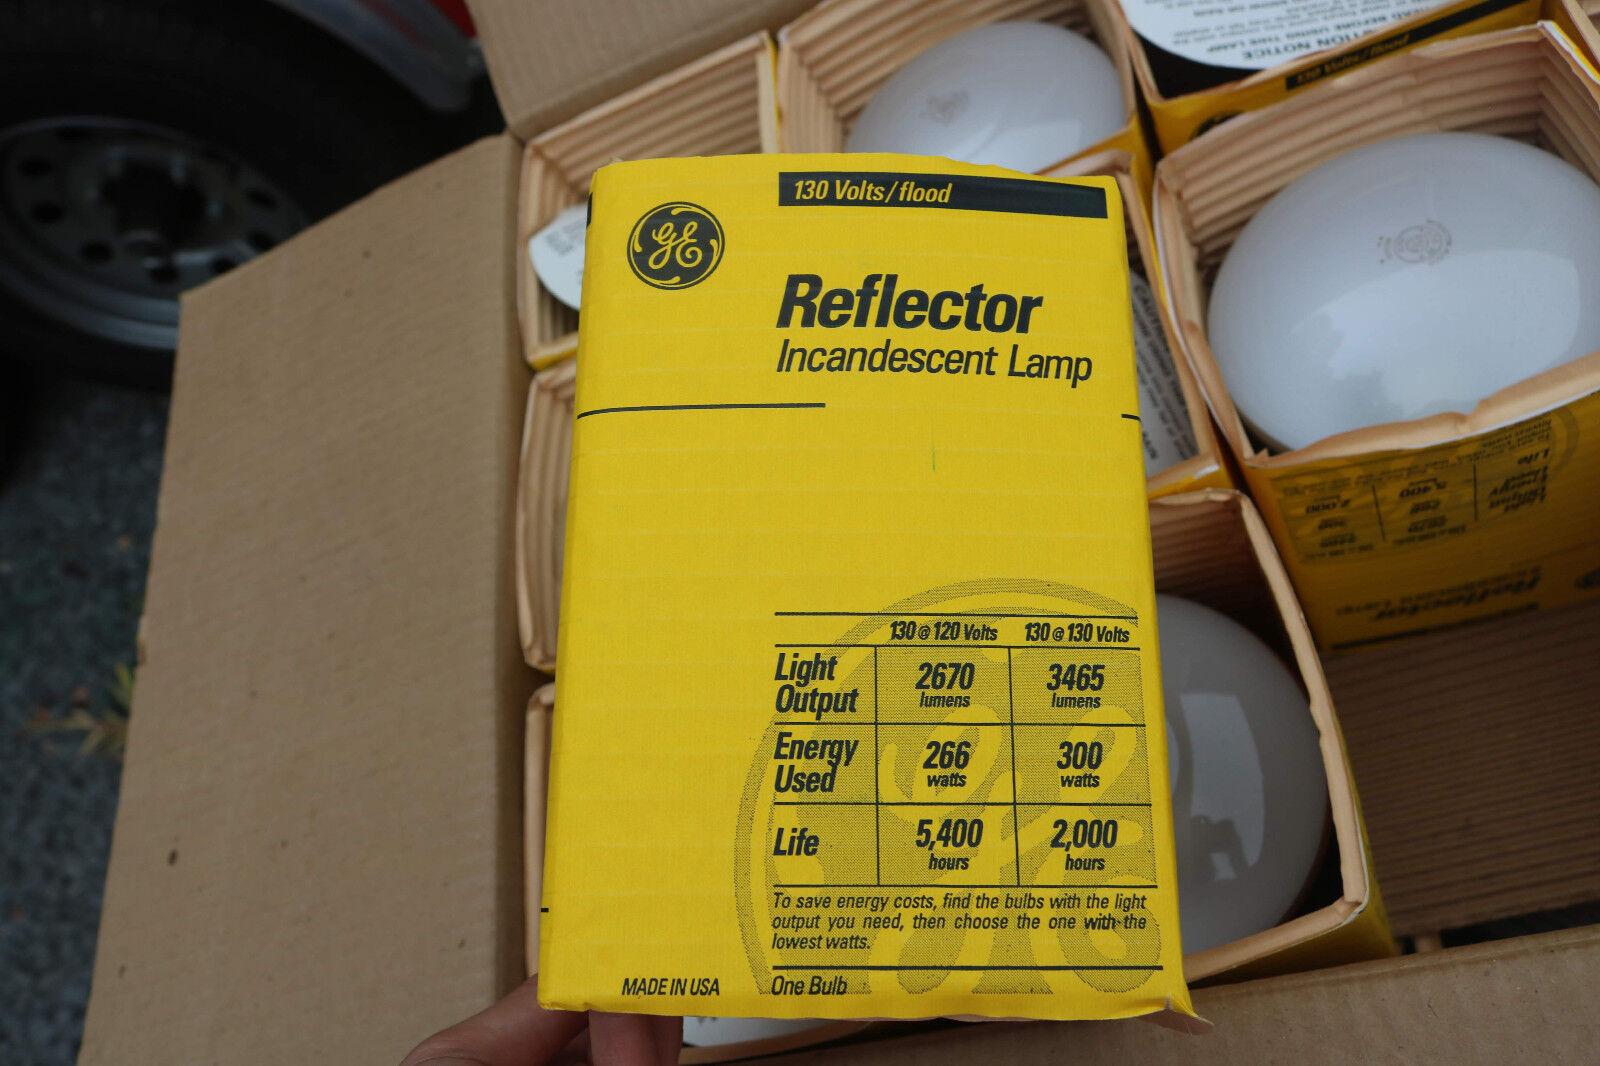 Box of 24 - GE 21215 Incandescent Lamps 300R FL Reflector Flood Light Bulb.